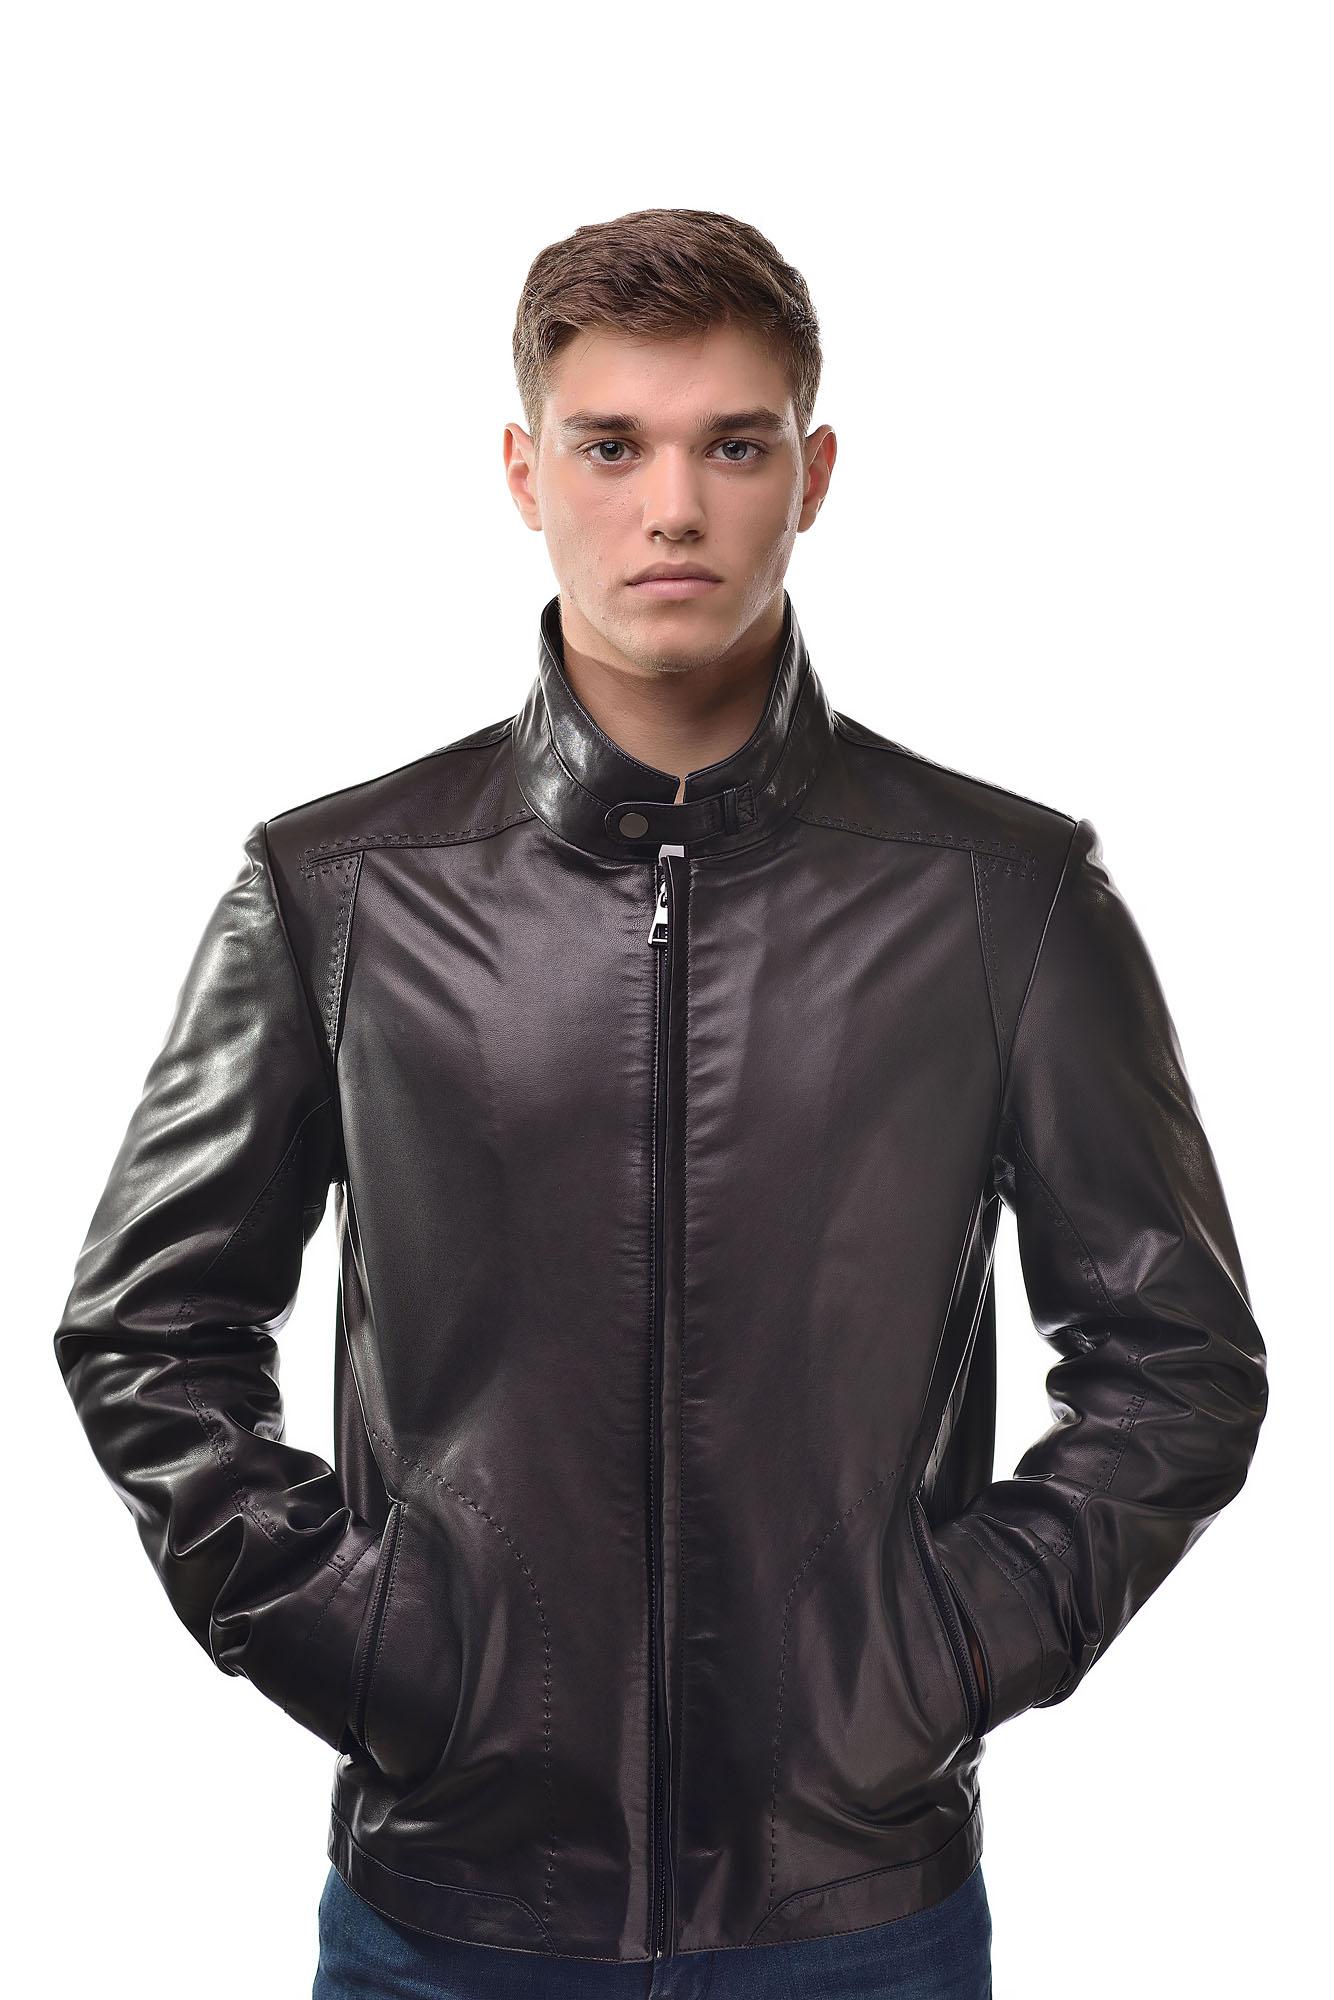 Мужская Кожаная куртка6115